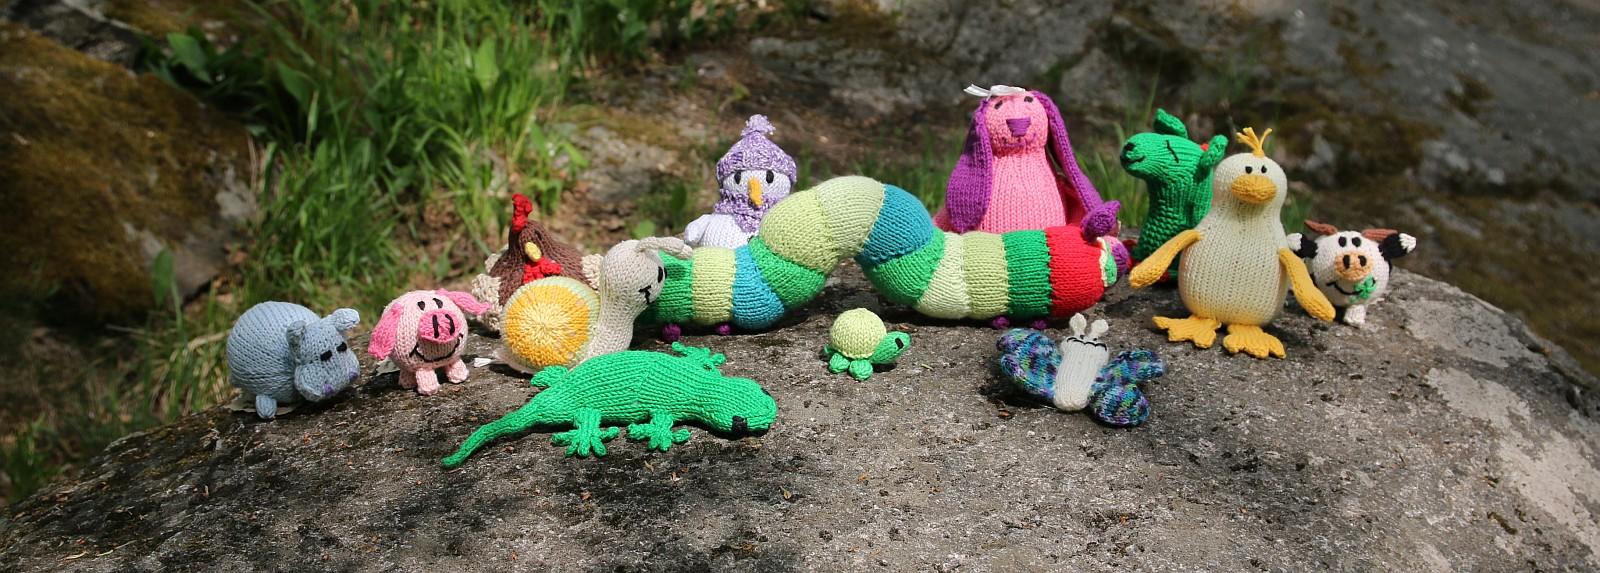 toys knitting patterns